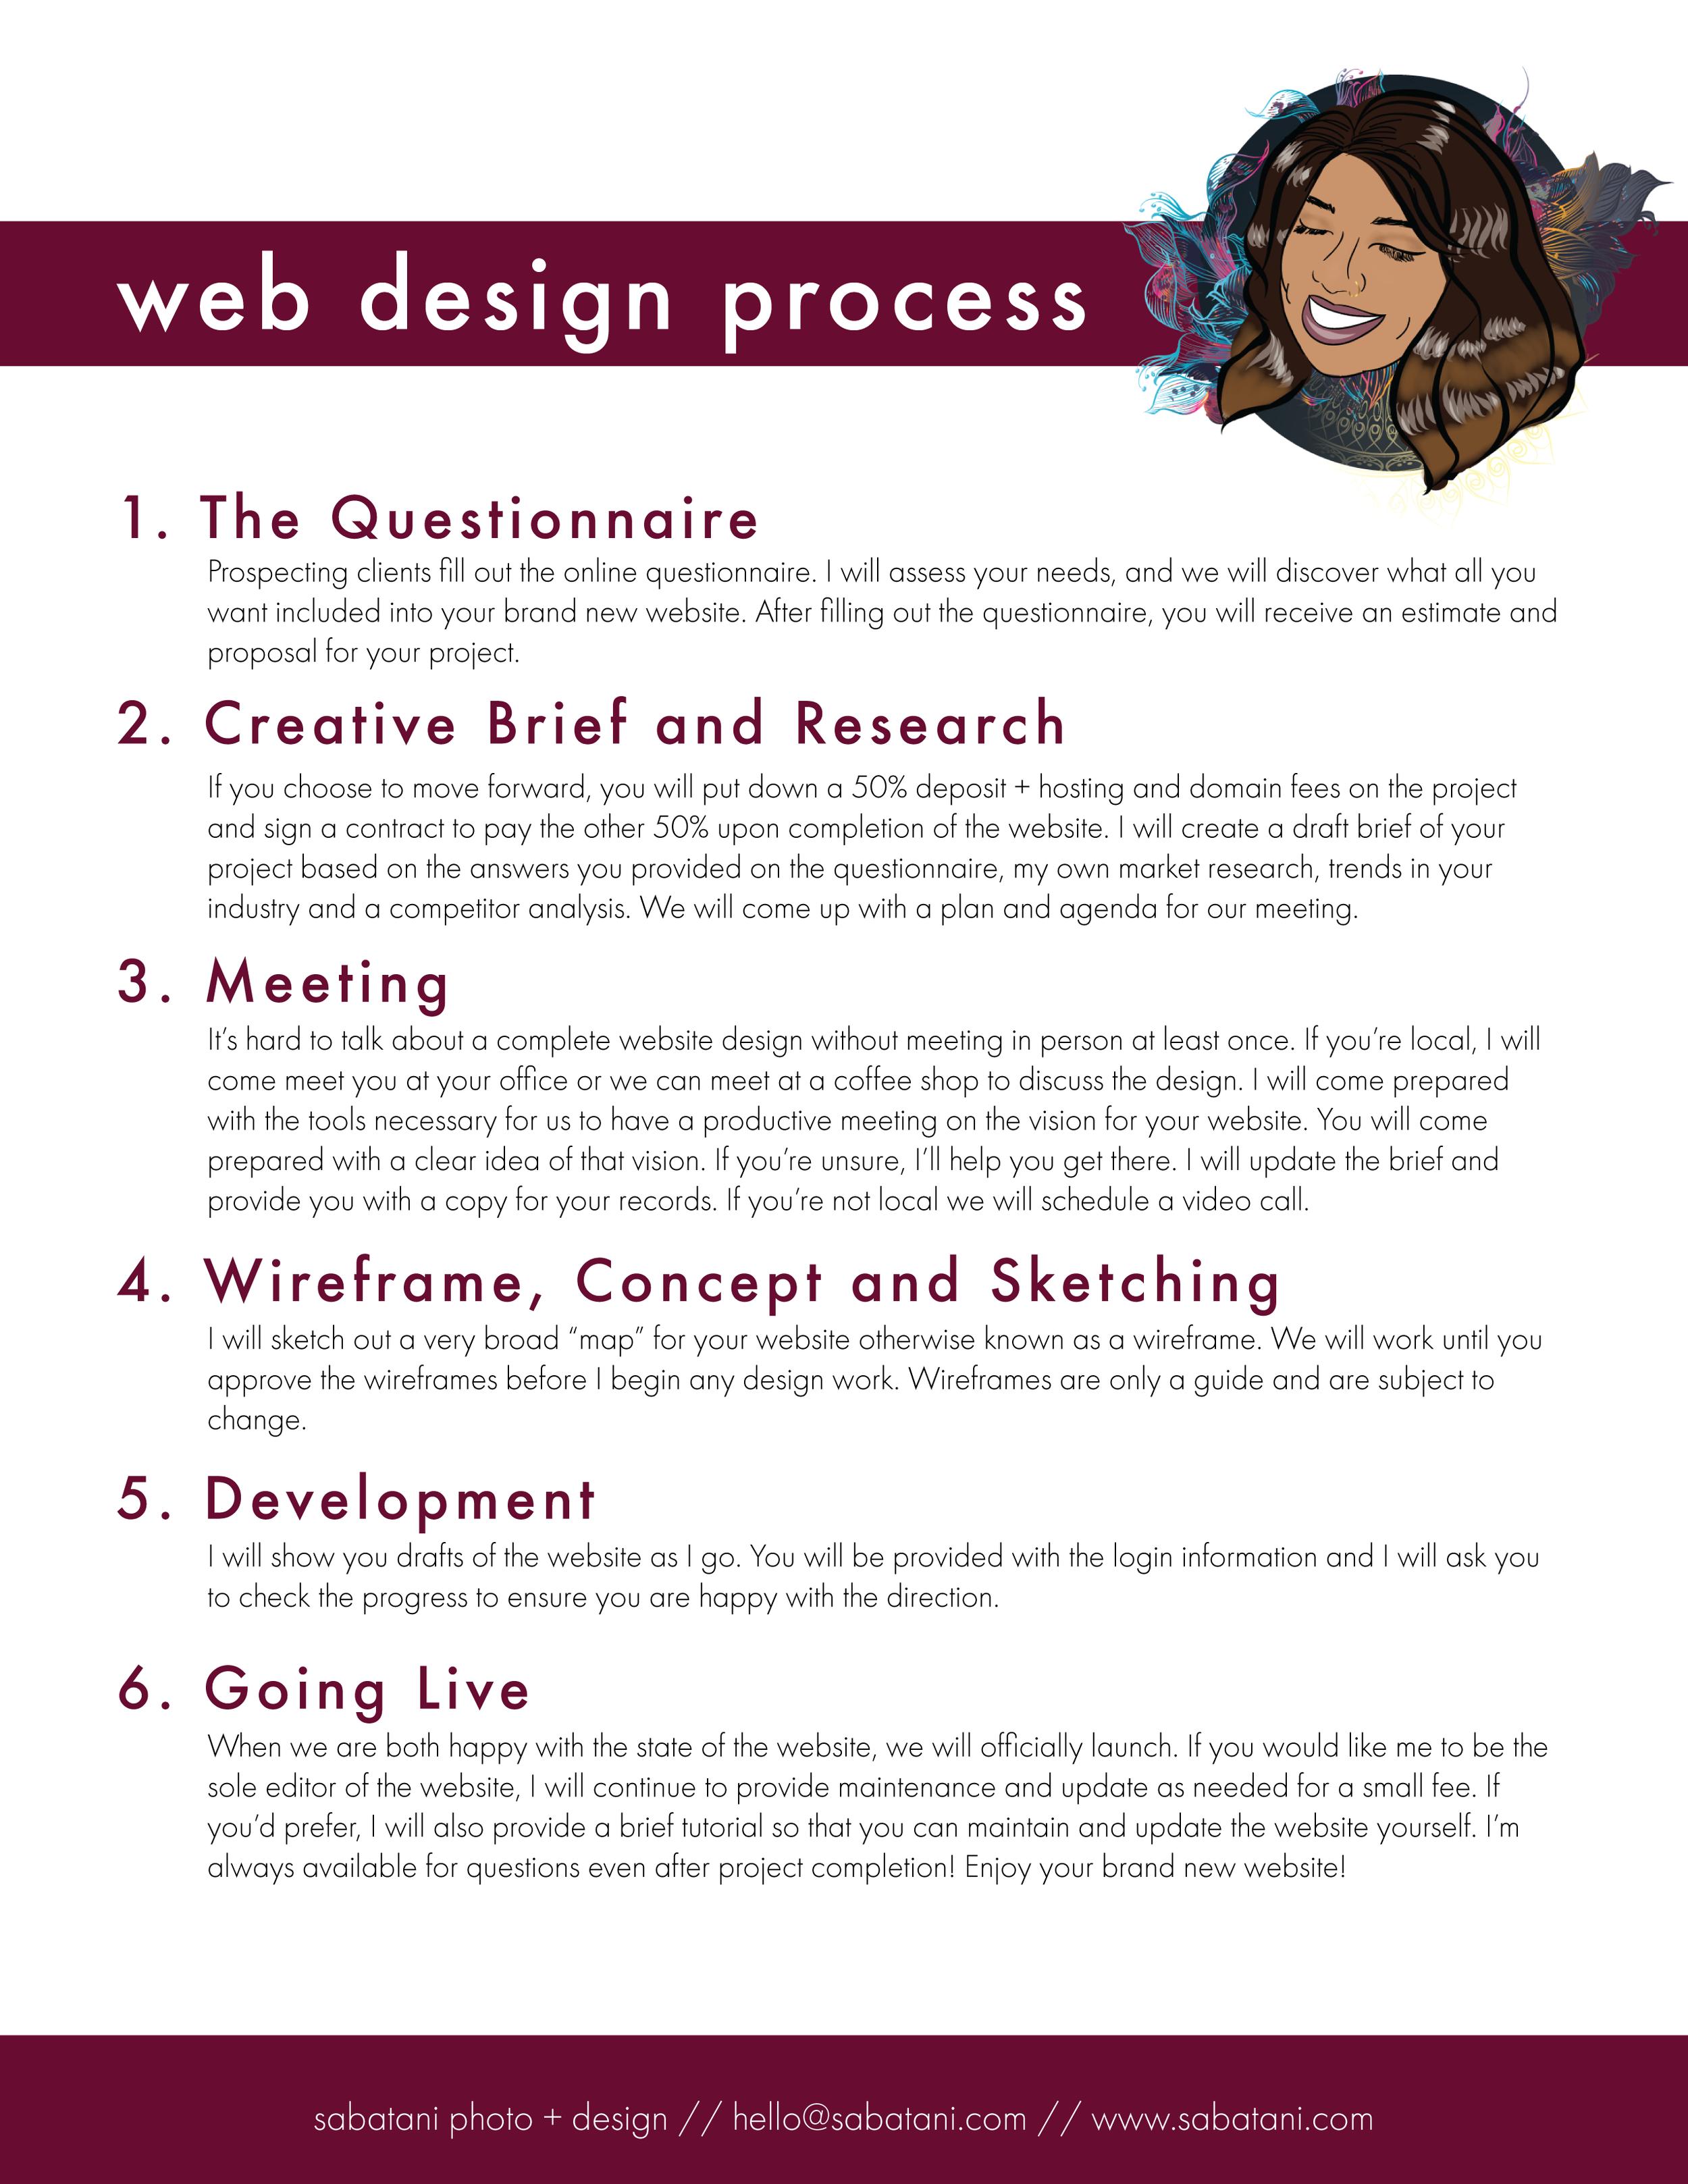 Web_DESIGNProcess-01.png